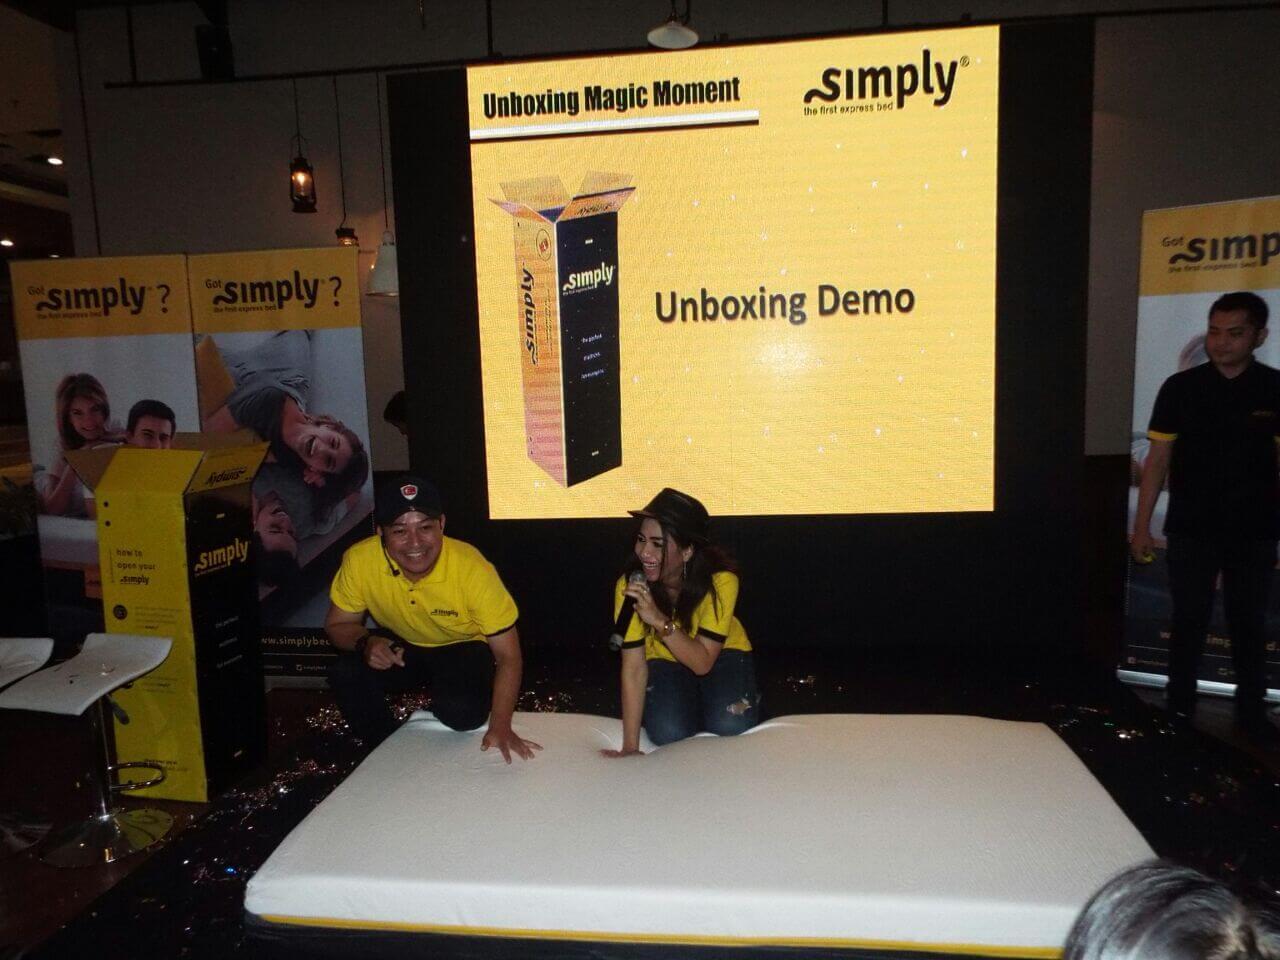 unboxing mattress 120*200 yang kurang dari 60 detik sudah mengembang